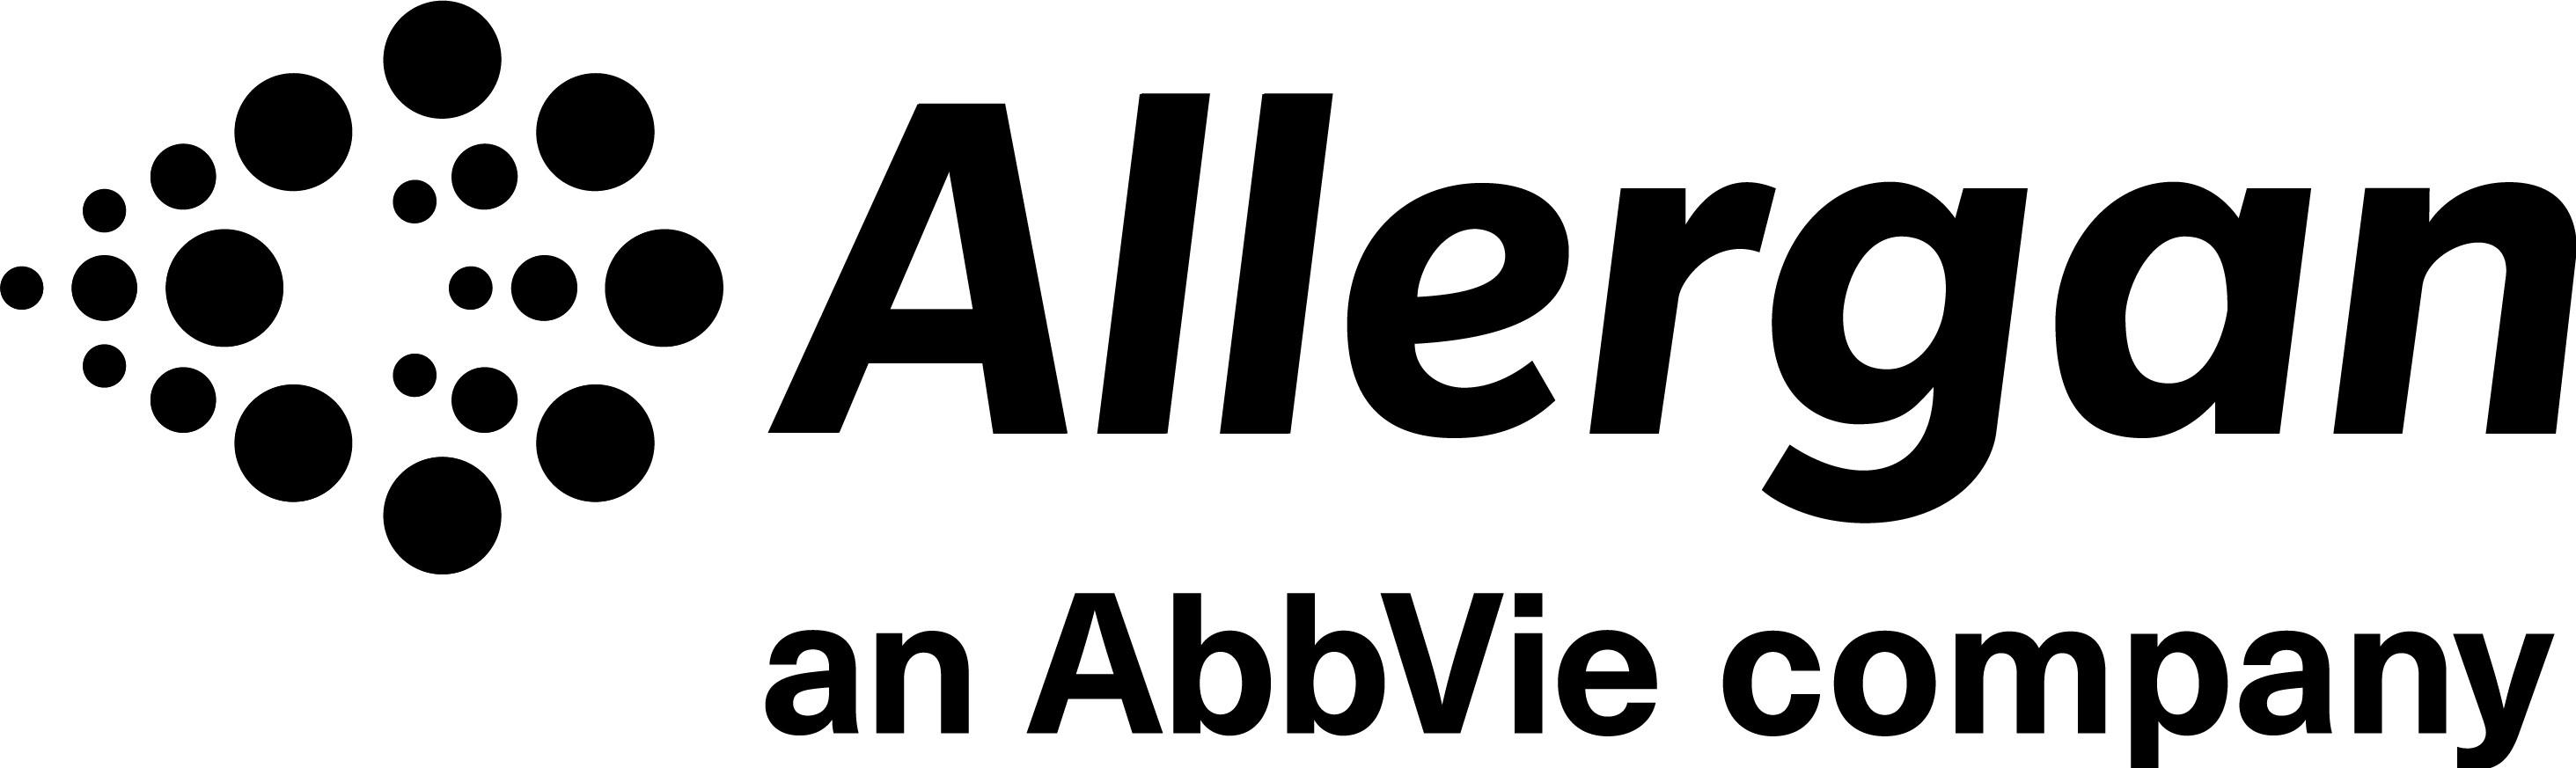 Allergan/Abbvie